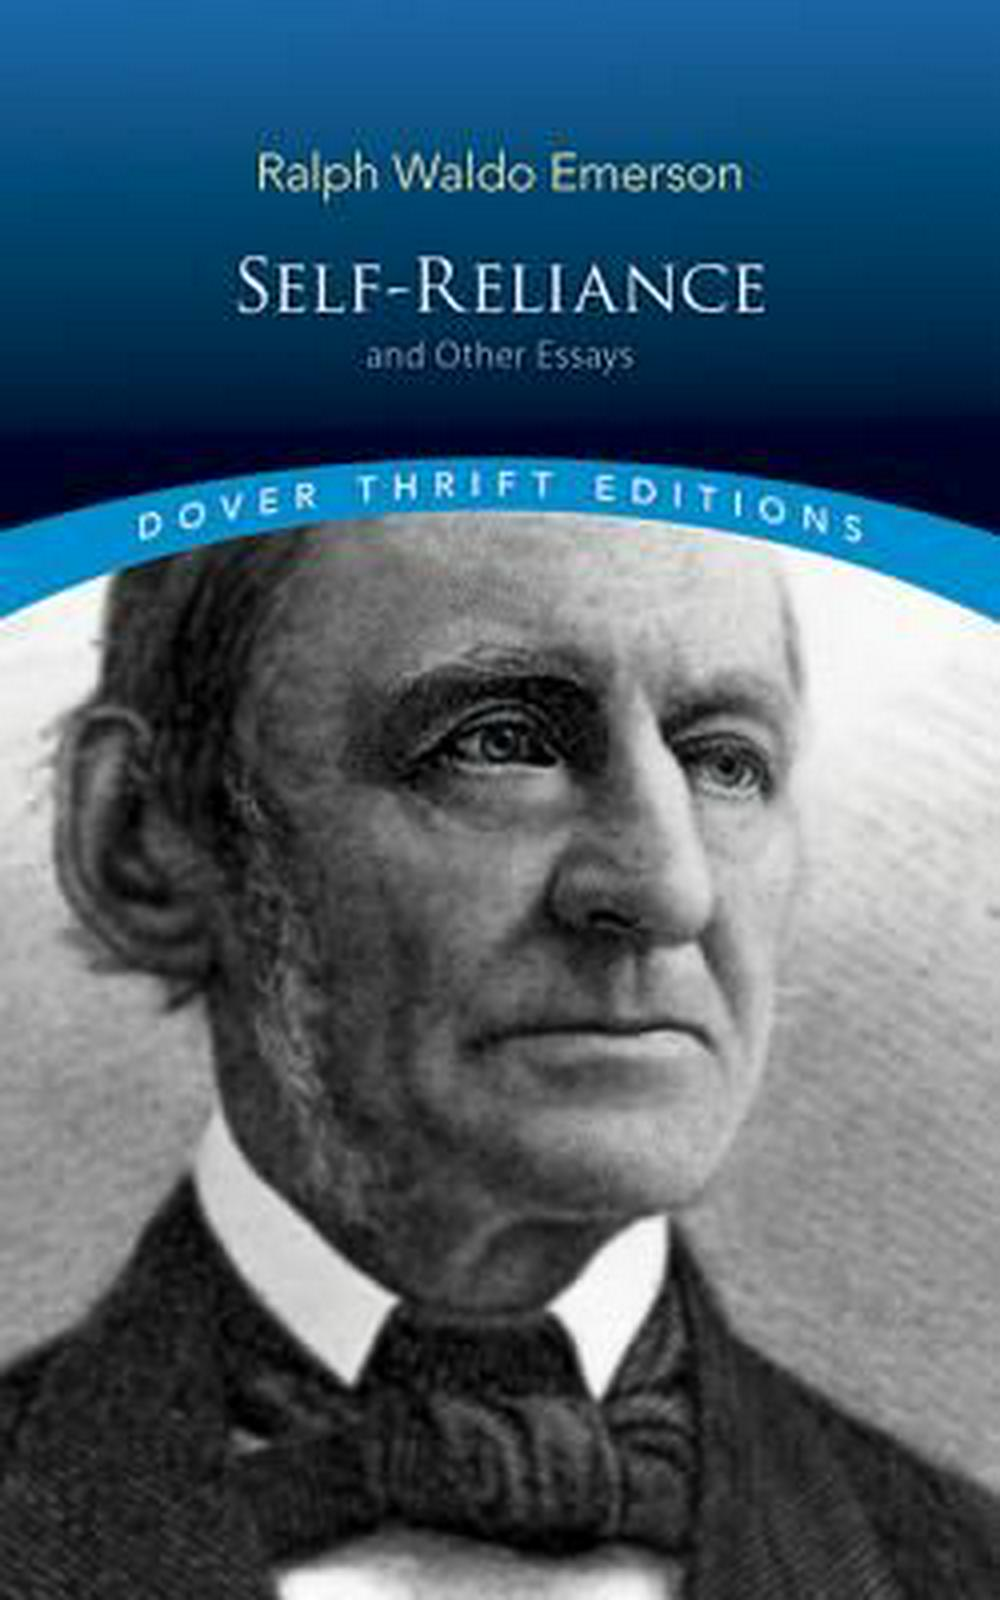 008 Essay Example 9780486277905r5c44ea15d6529 Self Reliance And Other Formidable Essays Ralph Waldo Emerson Pdf Ekşi Full